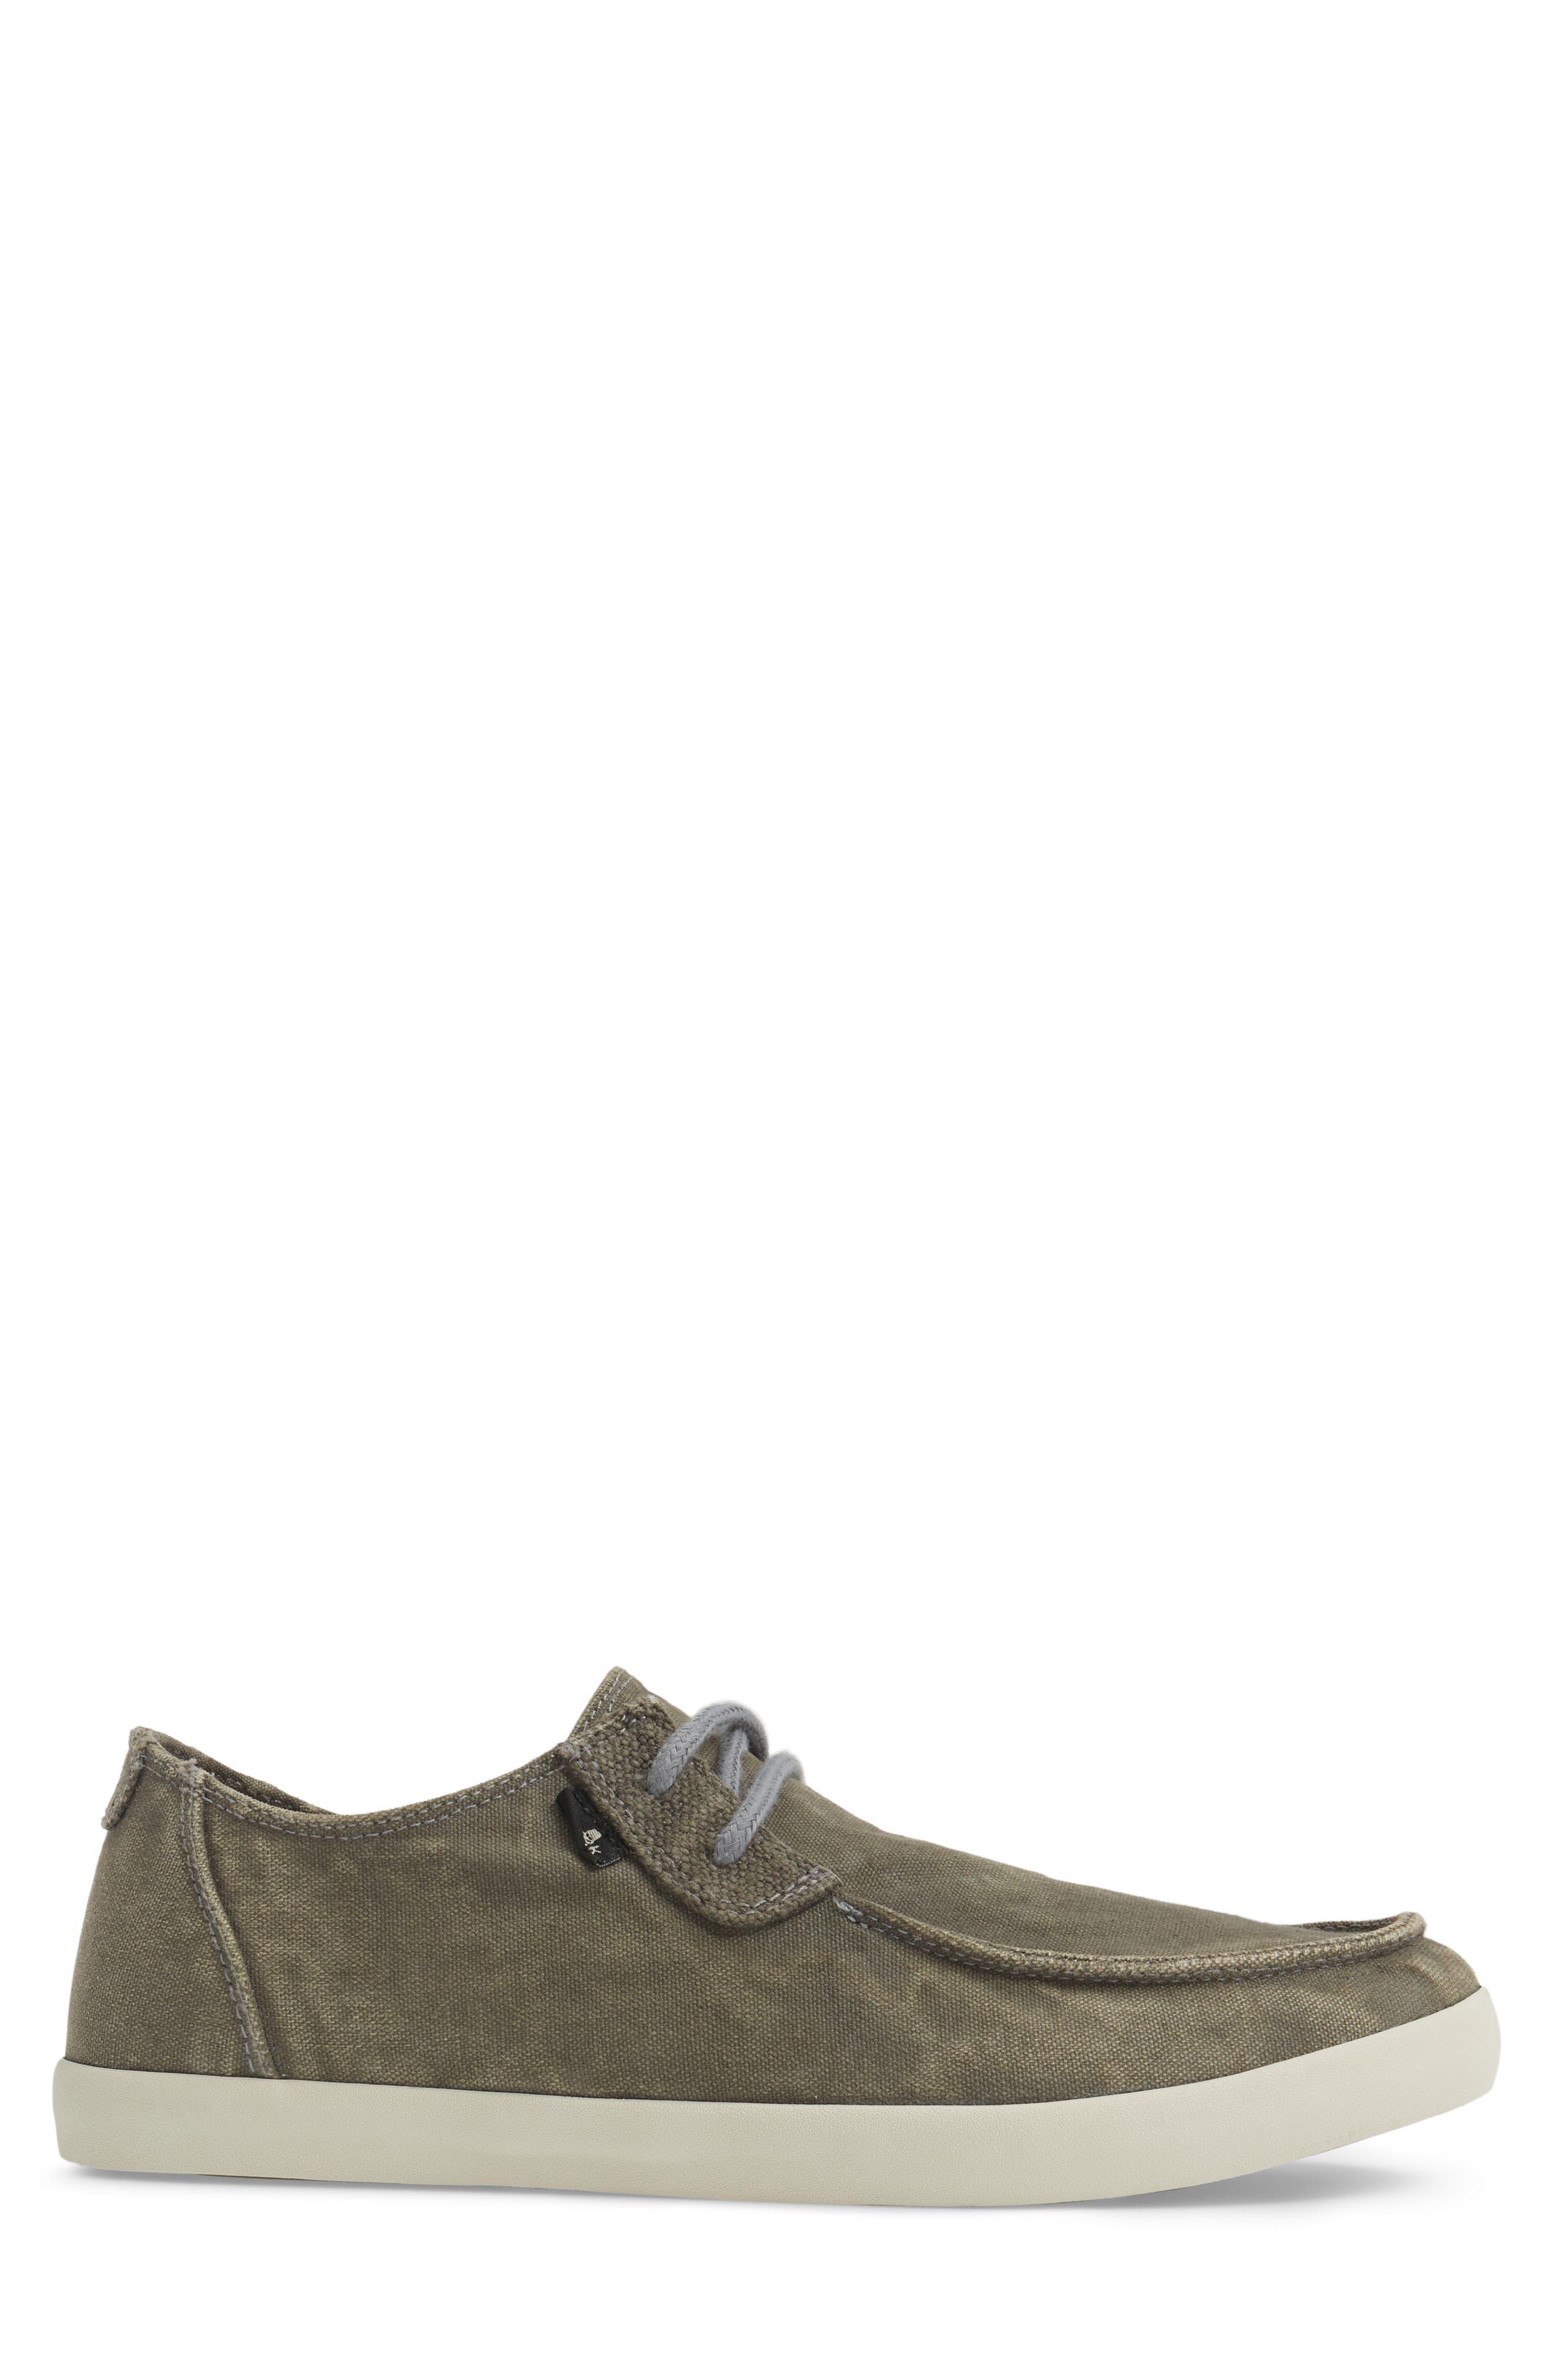 Numami Sneaker,                             Alternate thumbnail 3, color,                             051